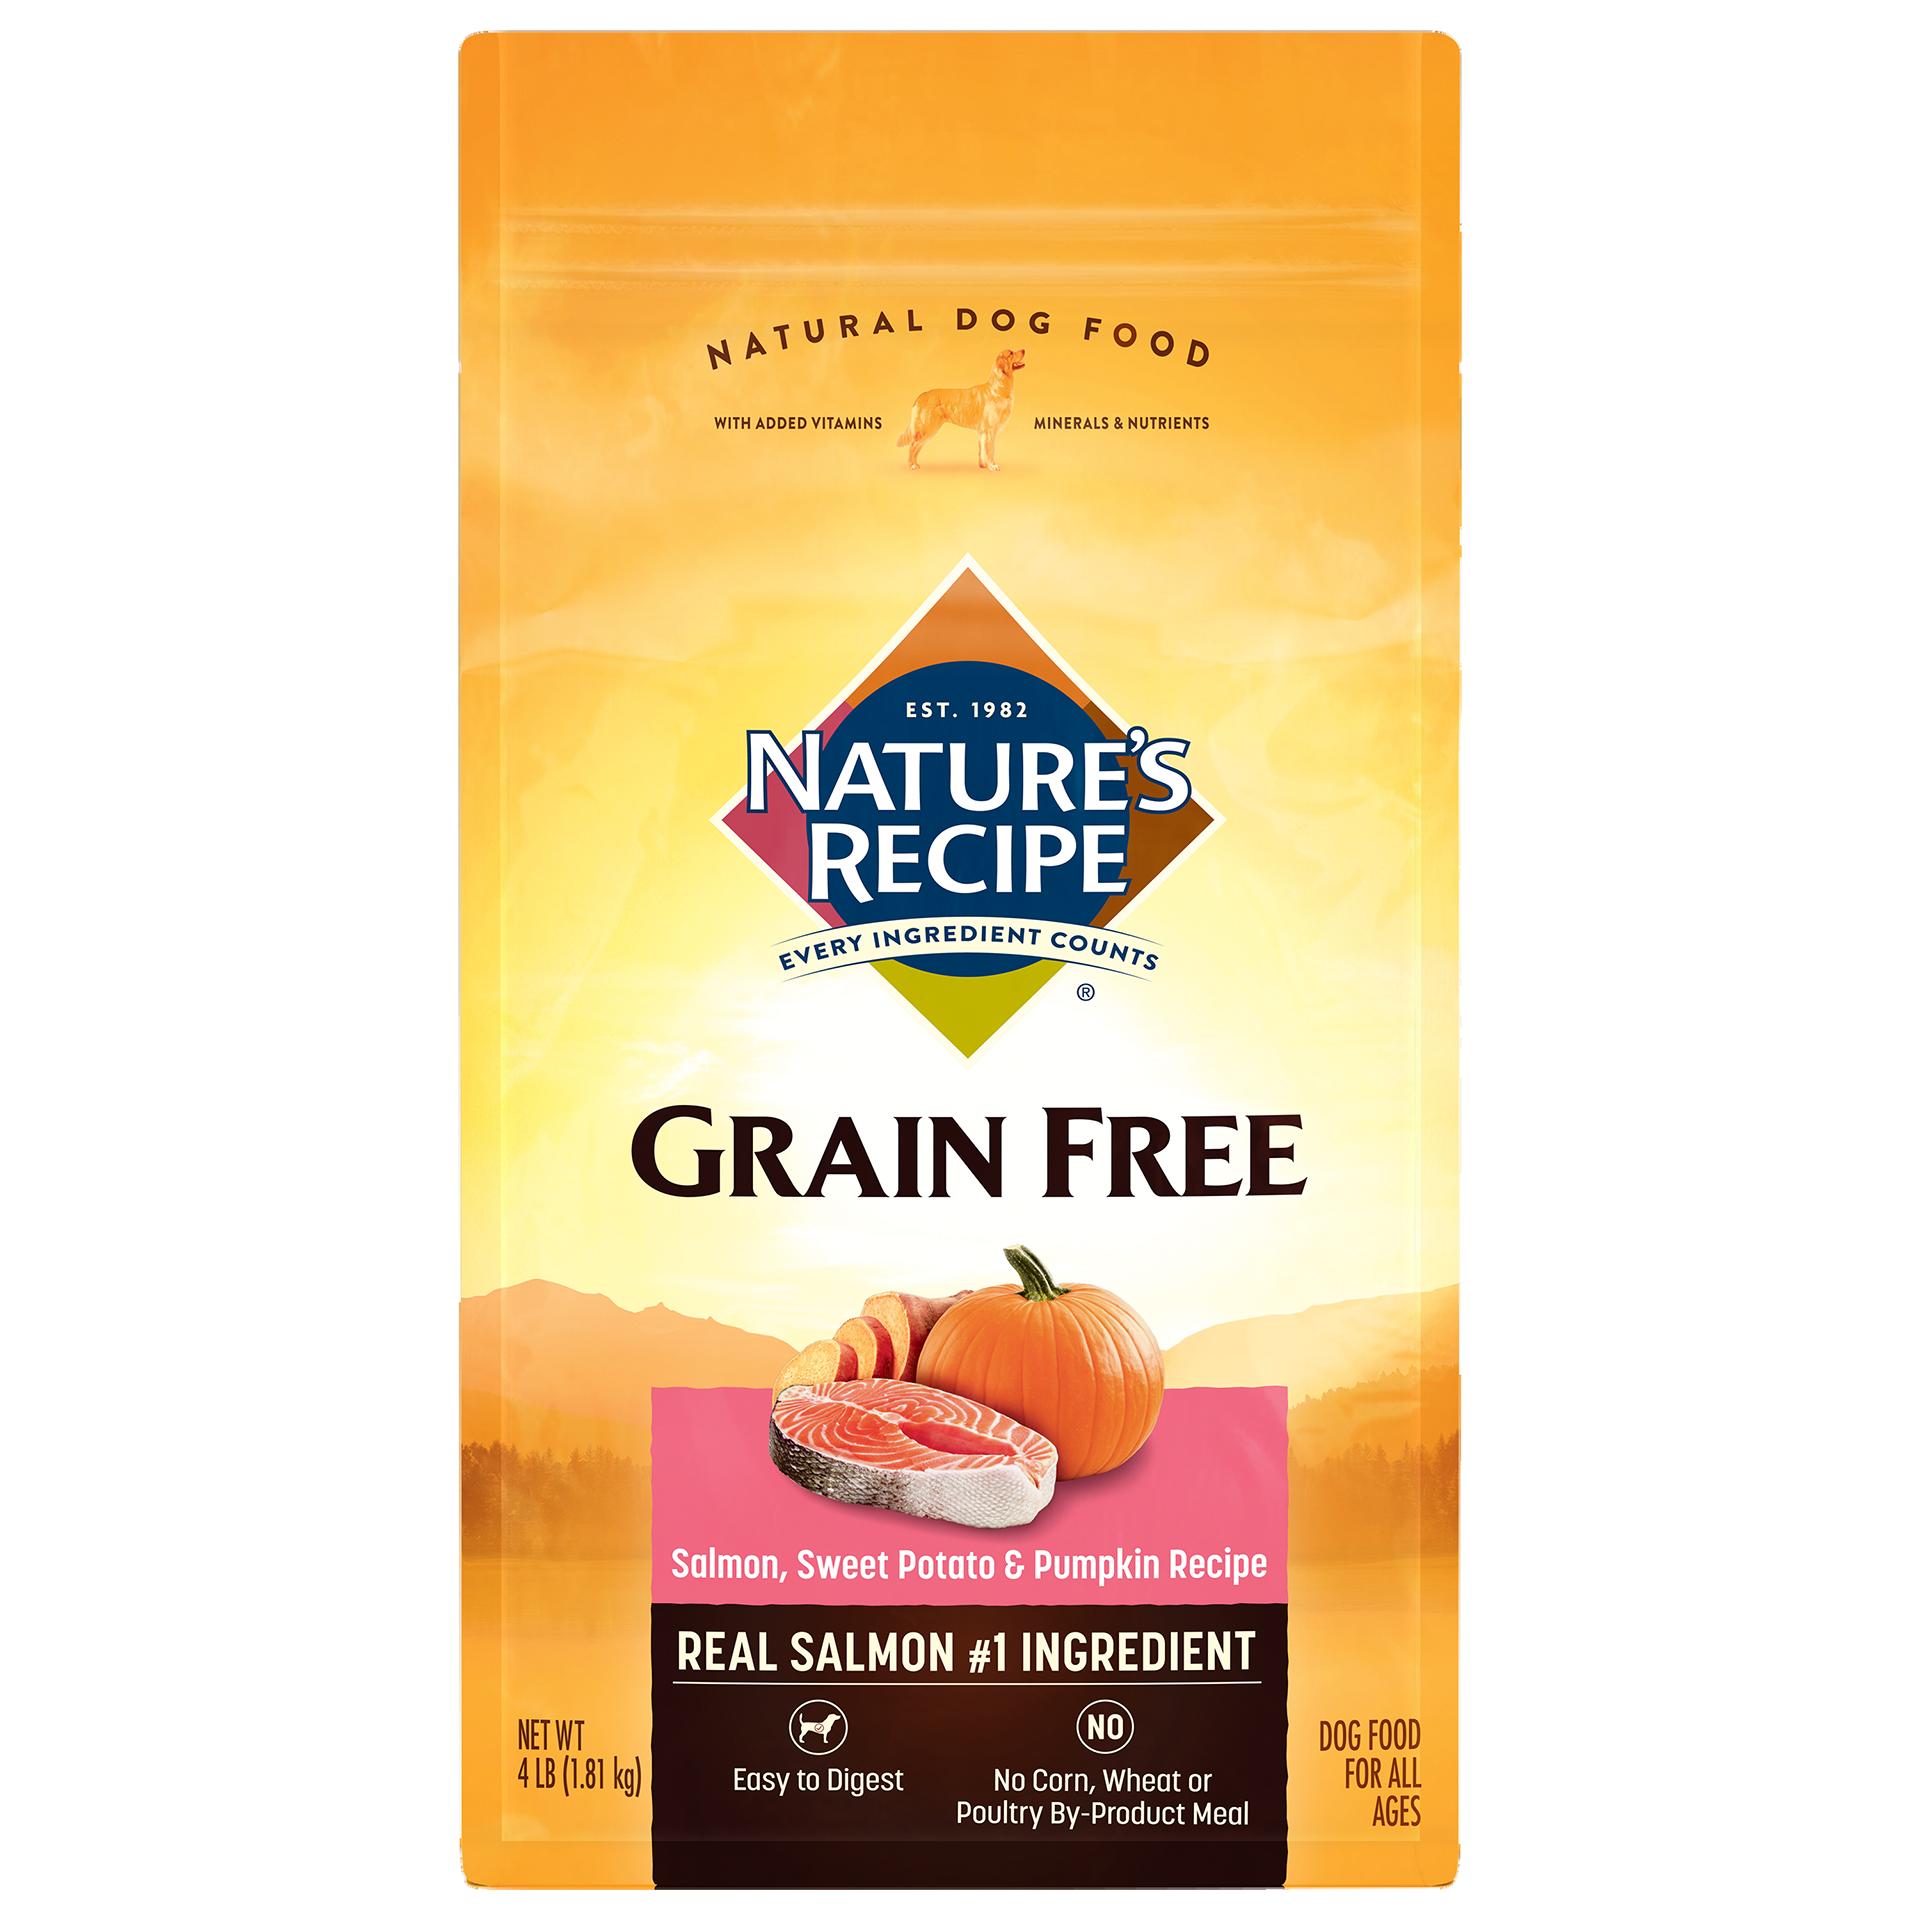 Grain Free Easy to Digest Salmon, Sweet Potato & PumpkinRecipeDog Food